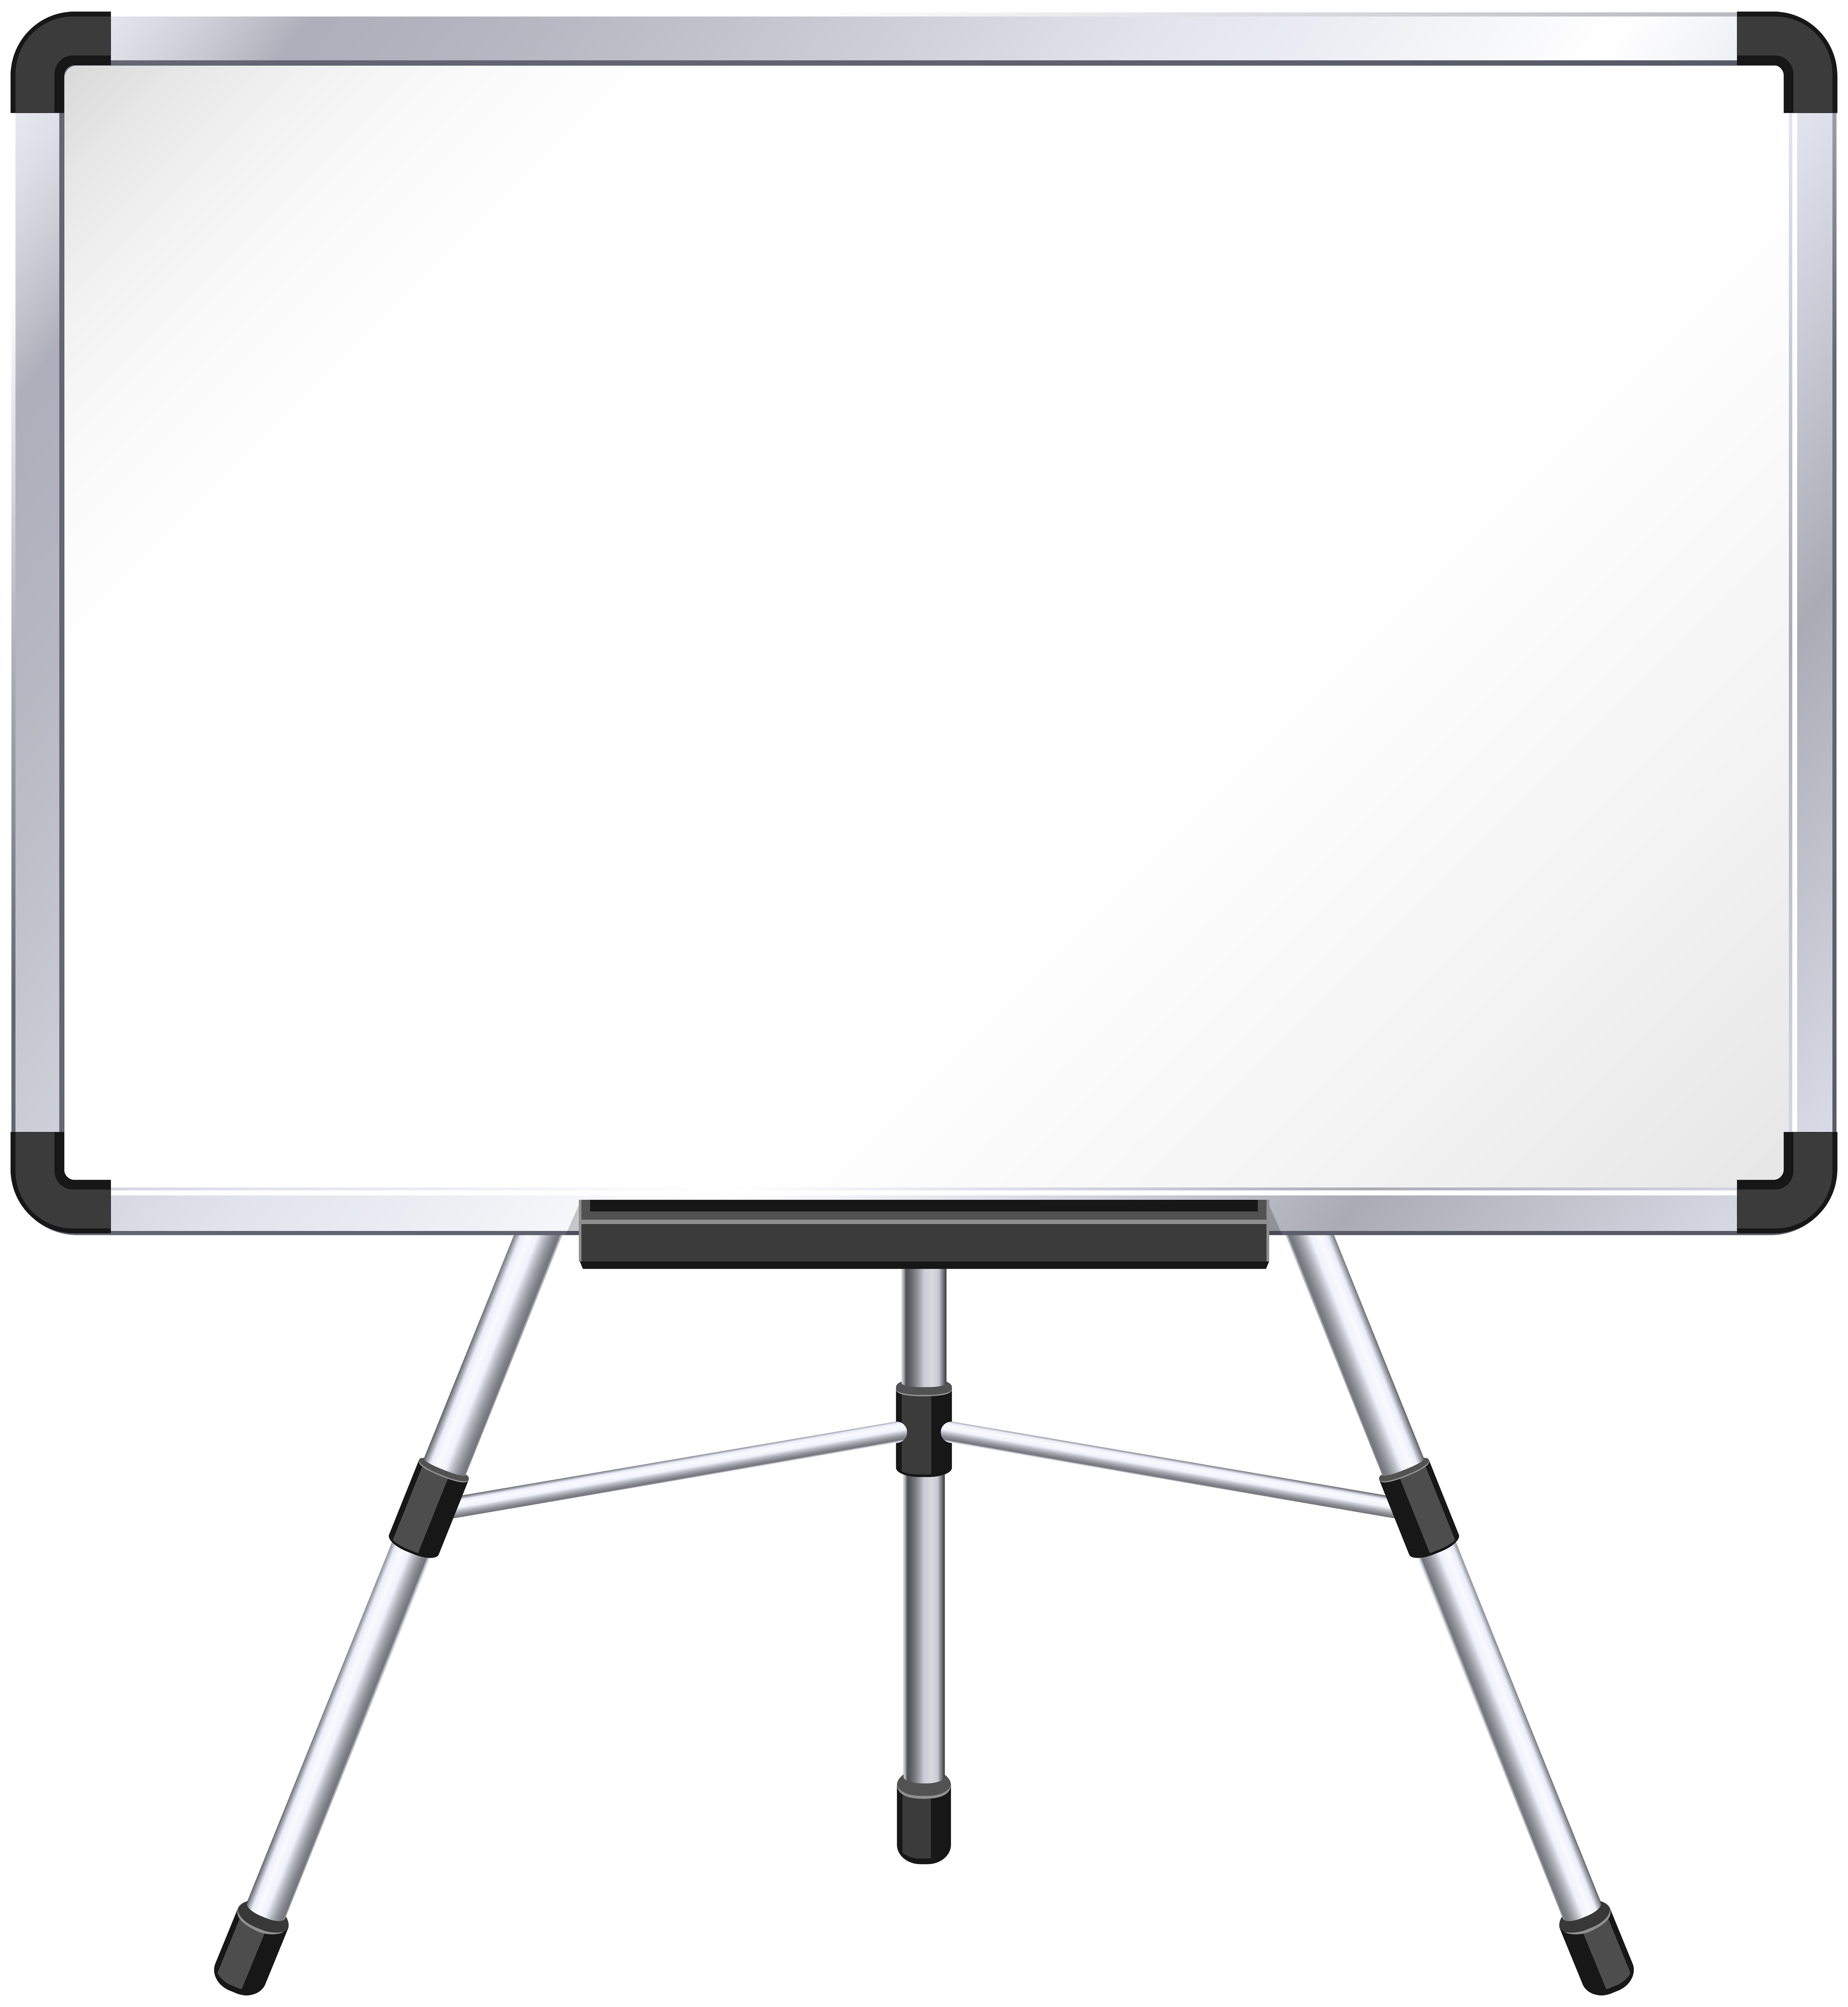 Whiteboard png clip art. Pen clipart white board